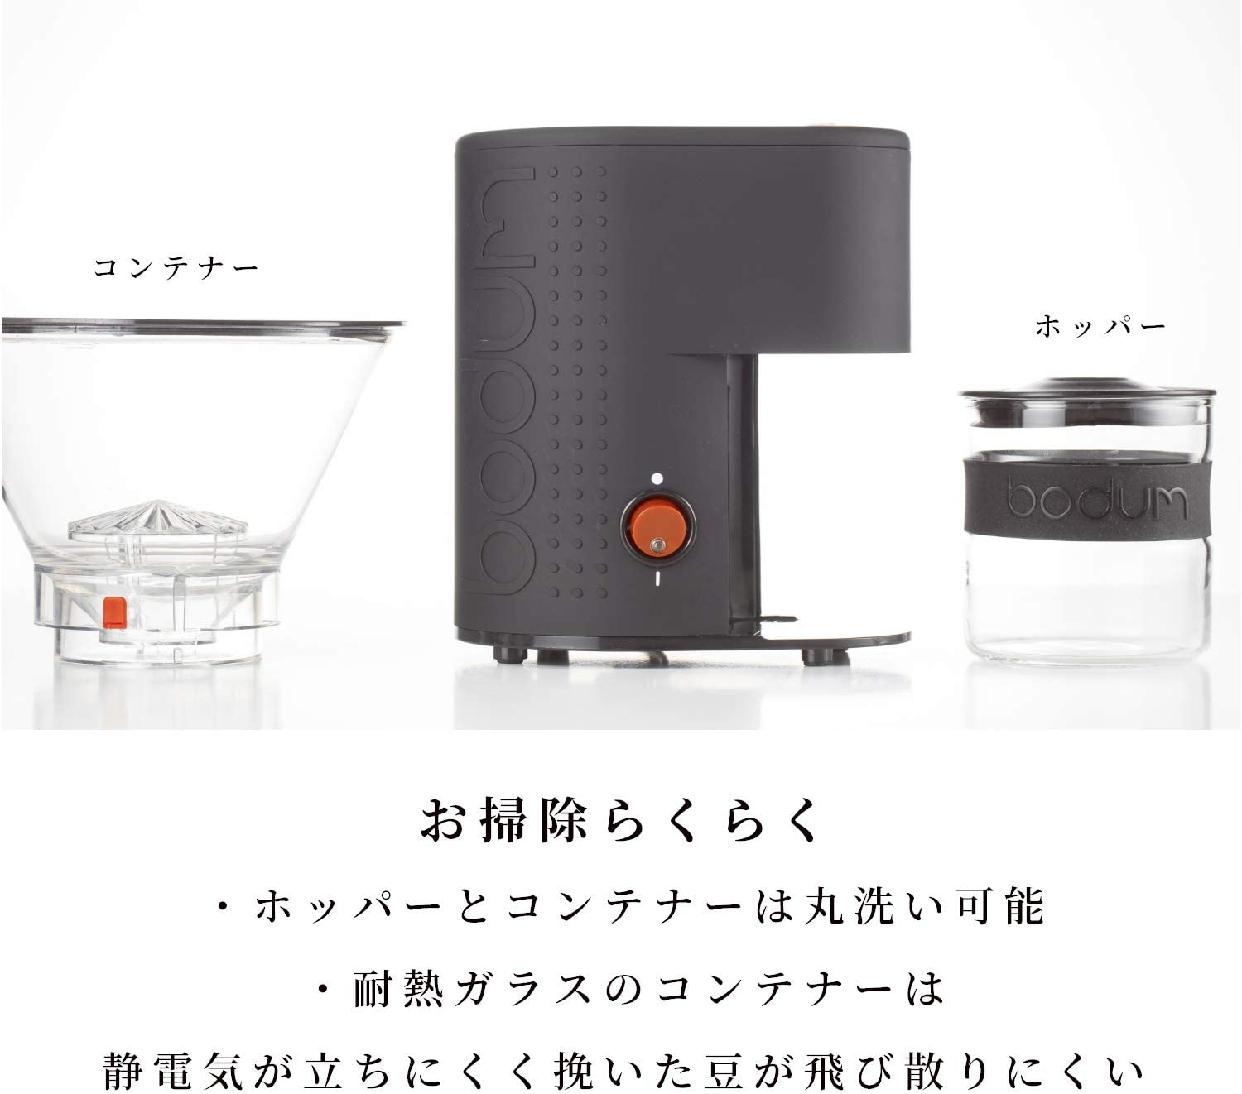 bodum(ボダム) BISTRO コーヒーグラインダー 10903-01JP-3の商品画像5